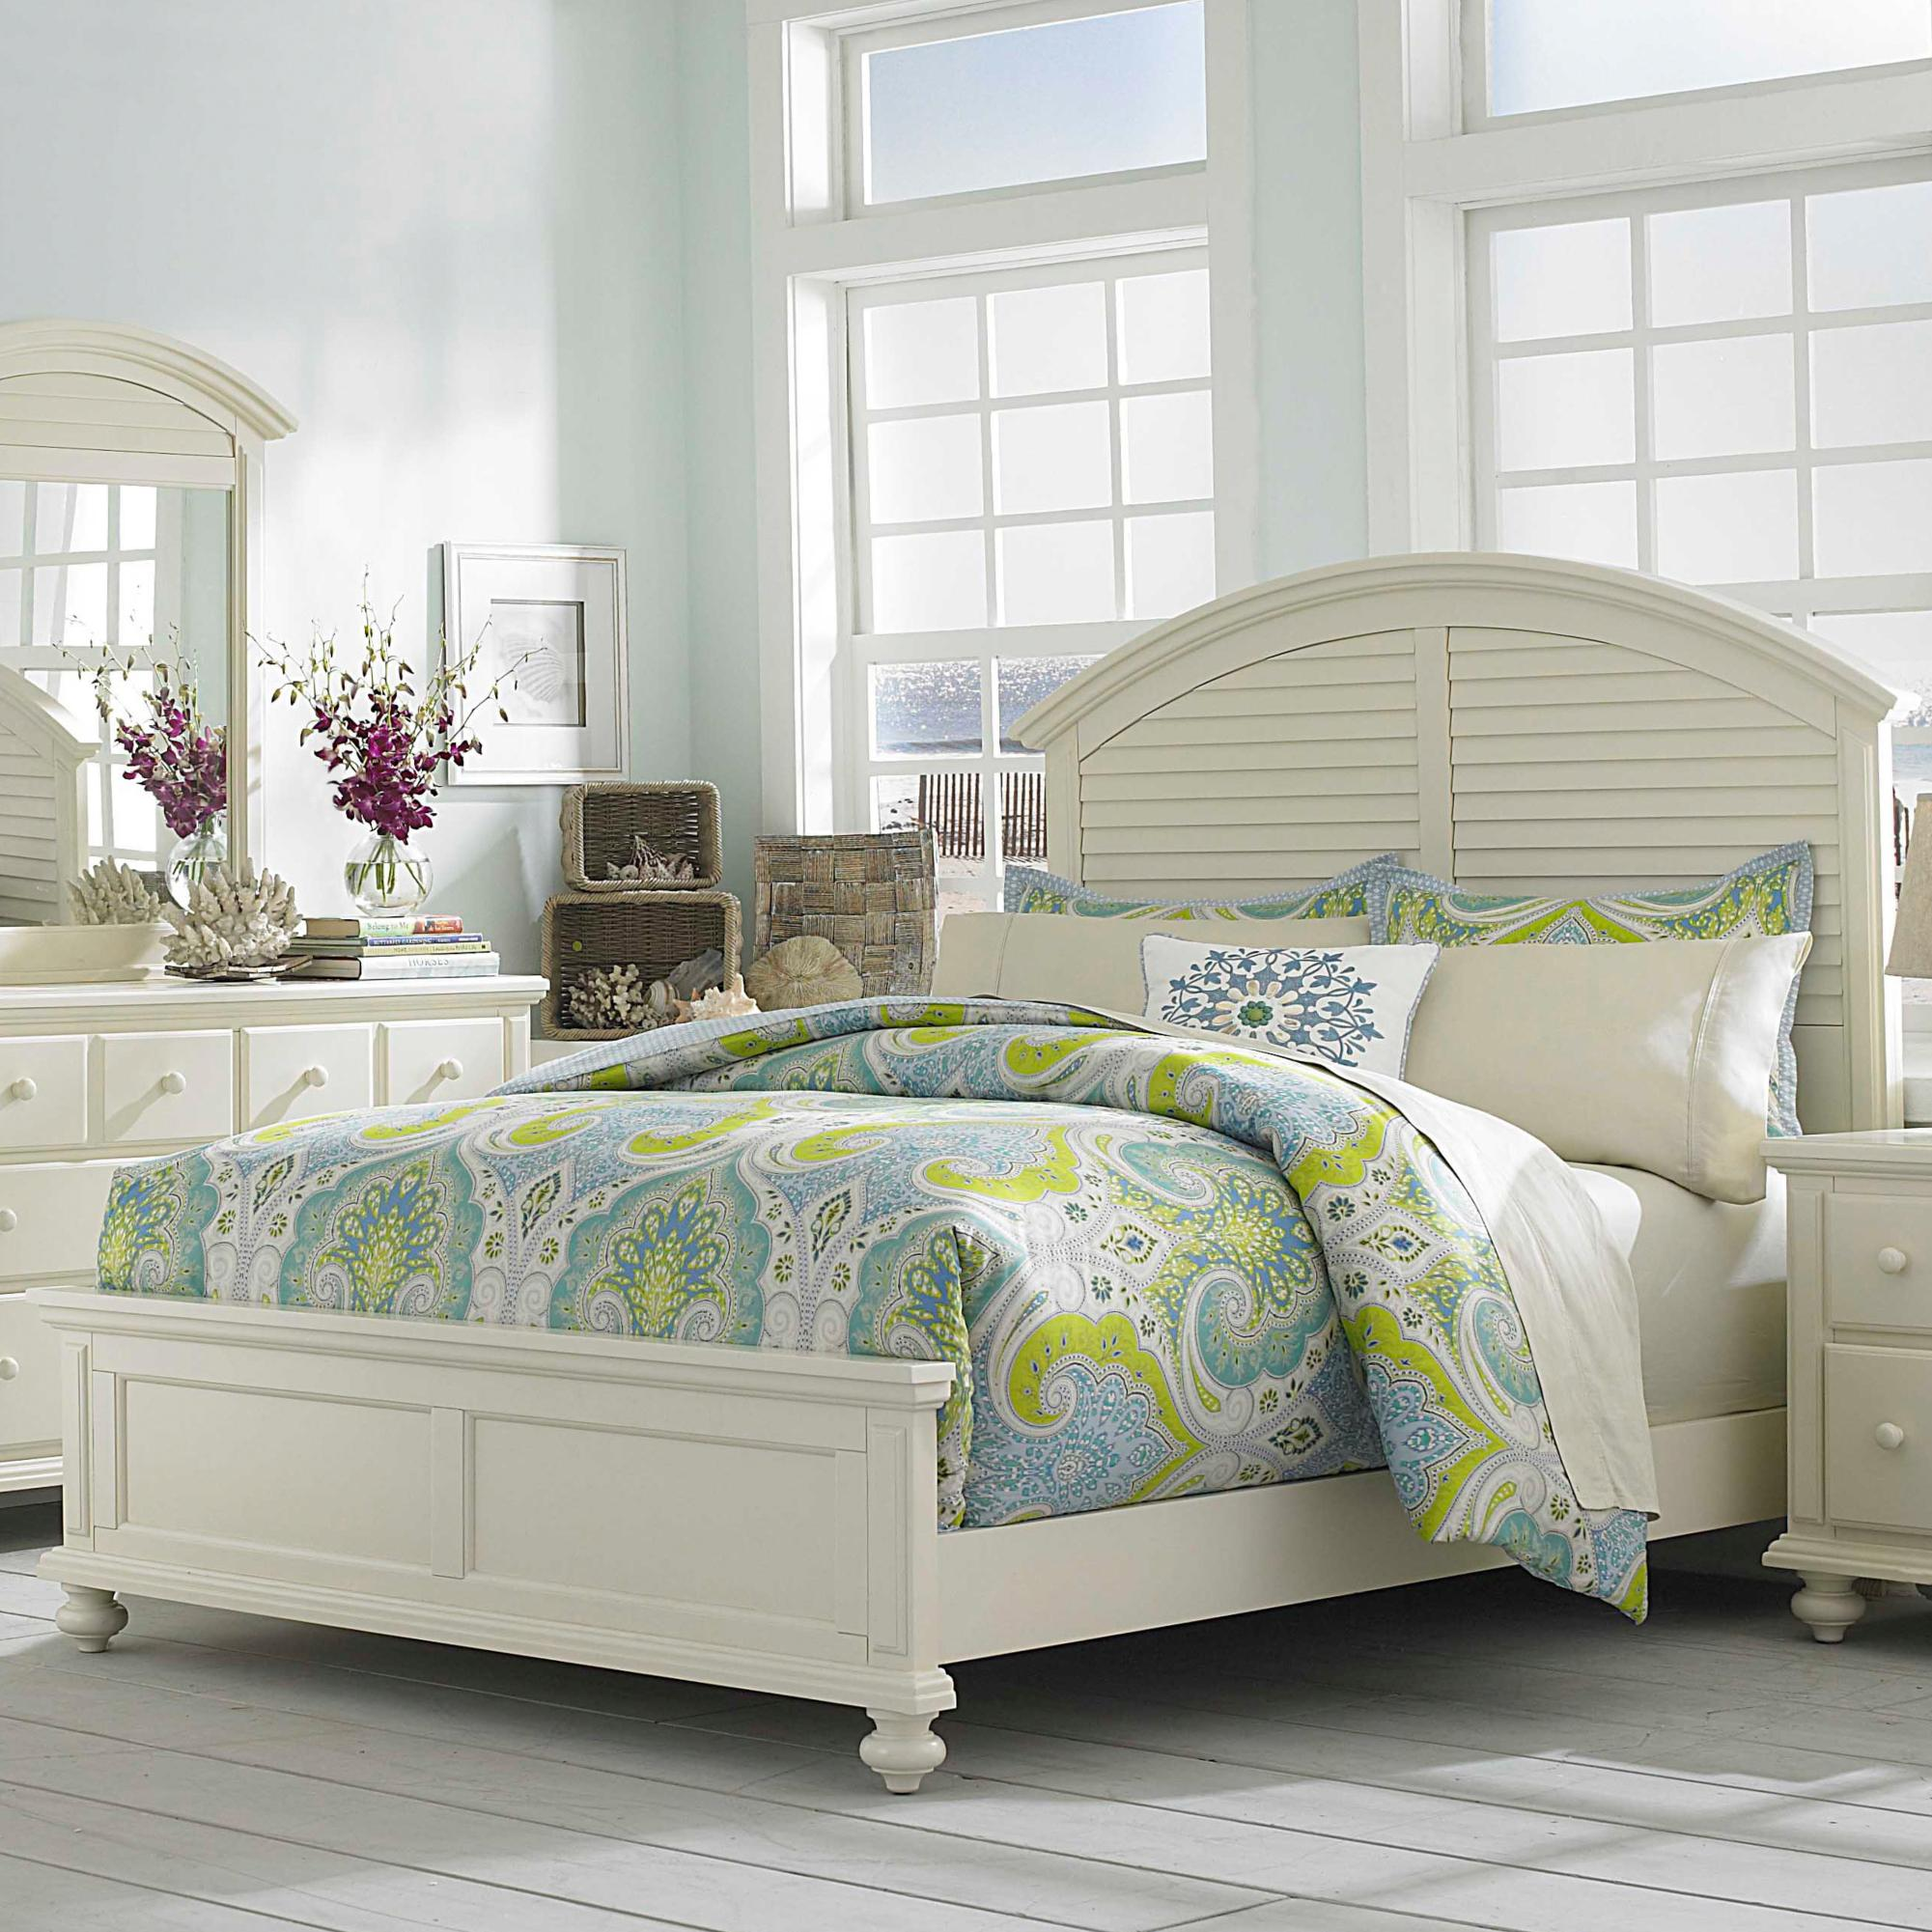 Broyhill Furniture Seabrooke California King Panel Bed - Item Number: 4471-254+255+455